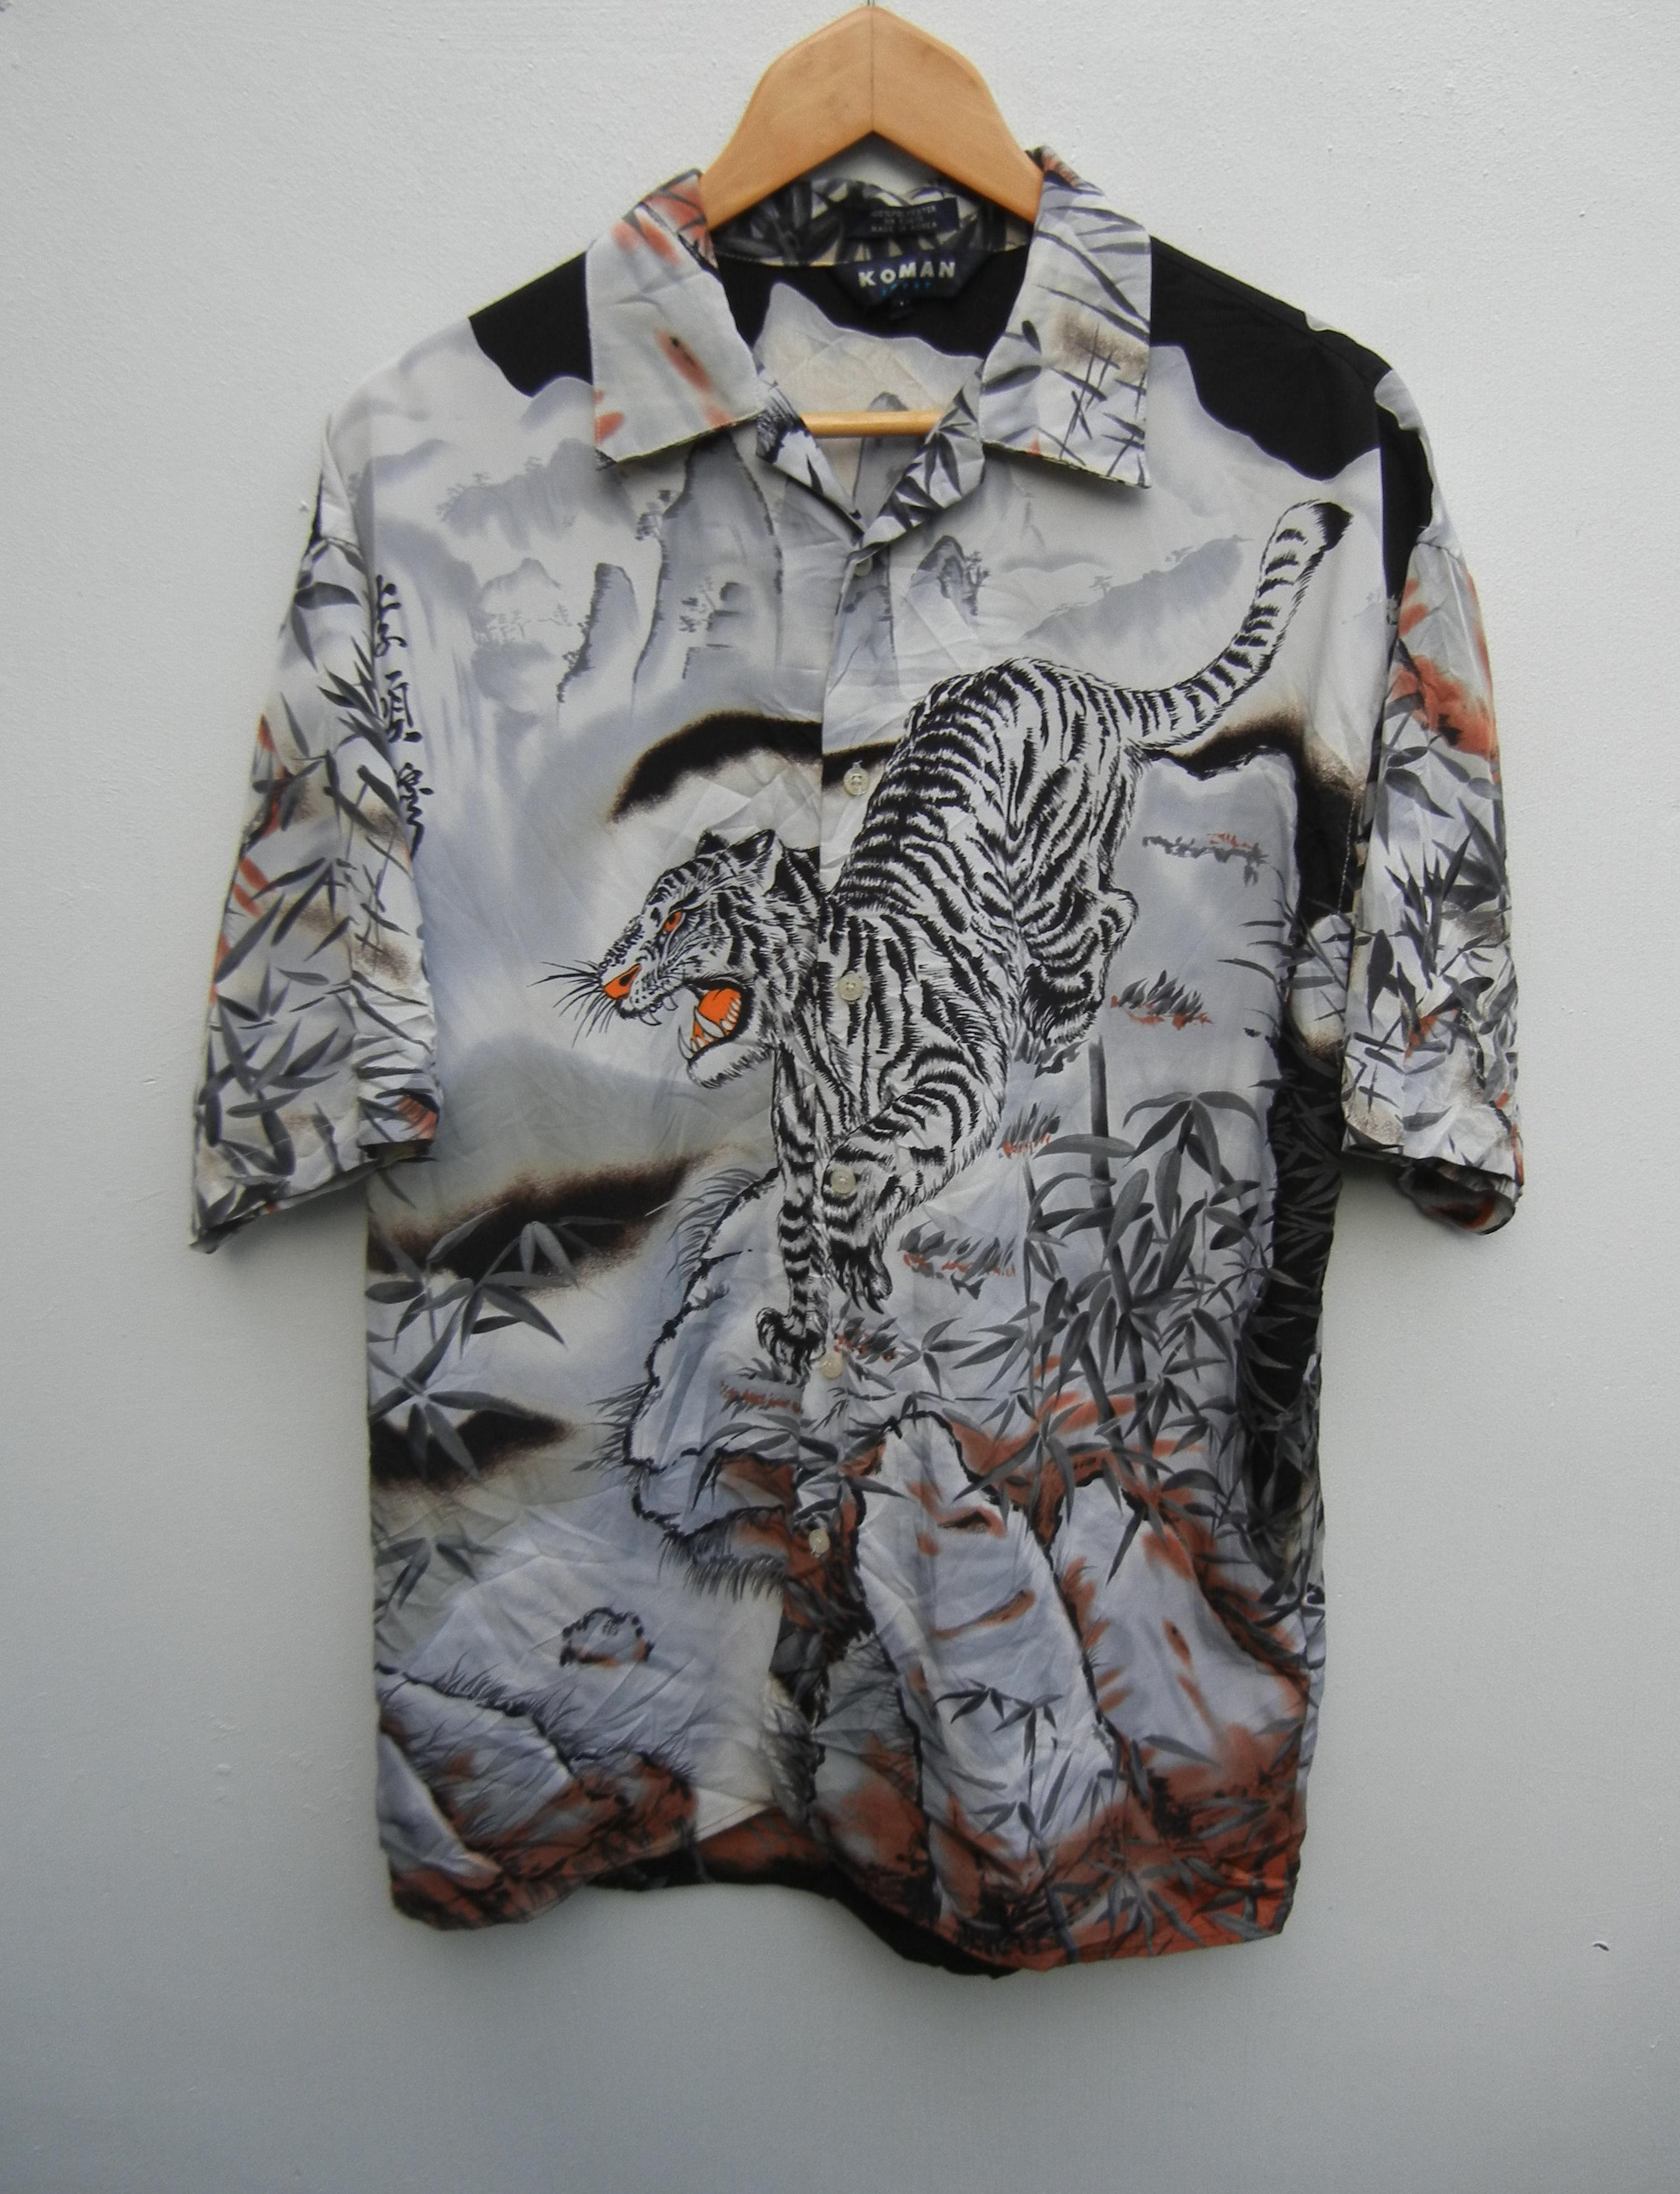 Japanese Brand Koman Sports Hawaiian Shirt Men Large Vintage 90 S White Tiger Roaring Yakuza Rockabilly Shirt Hawaiian Surfer Button Down Shirt Size Xl [ 3525 x 2699 Pixel ]